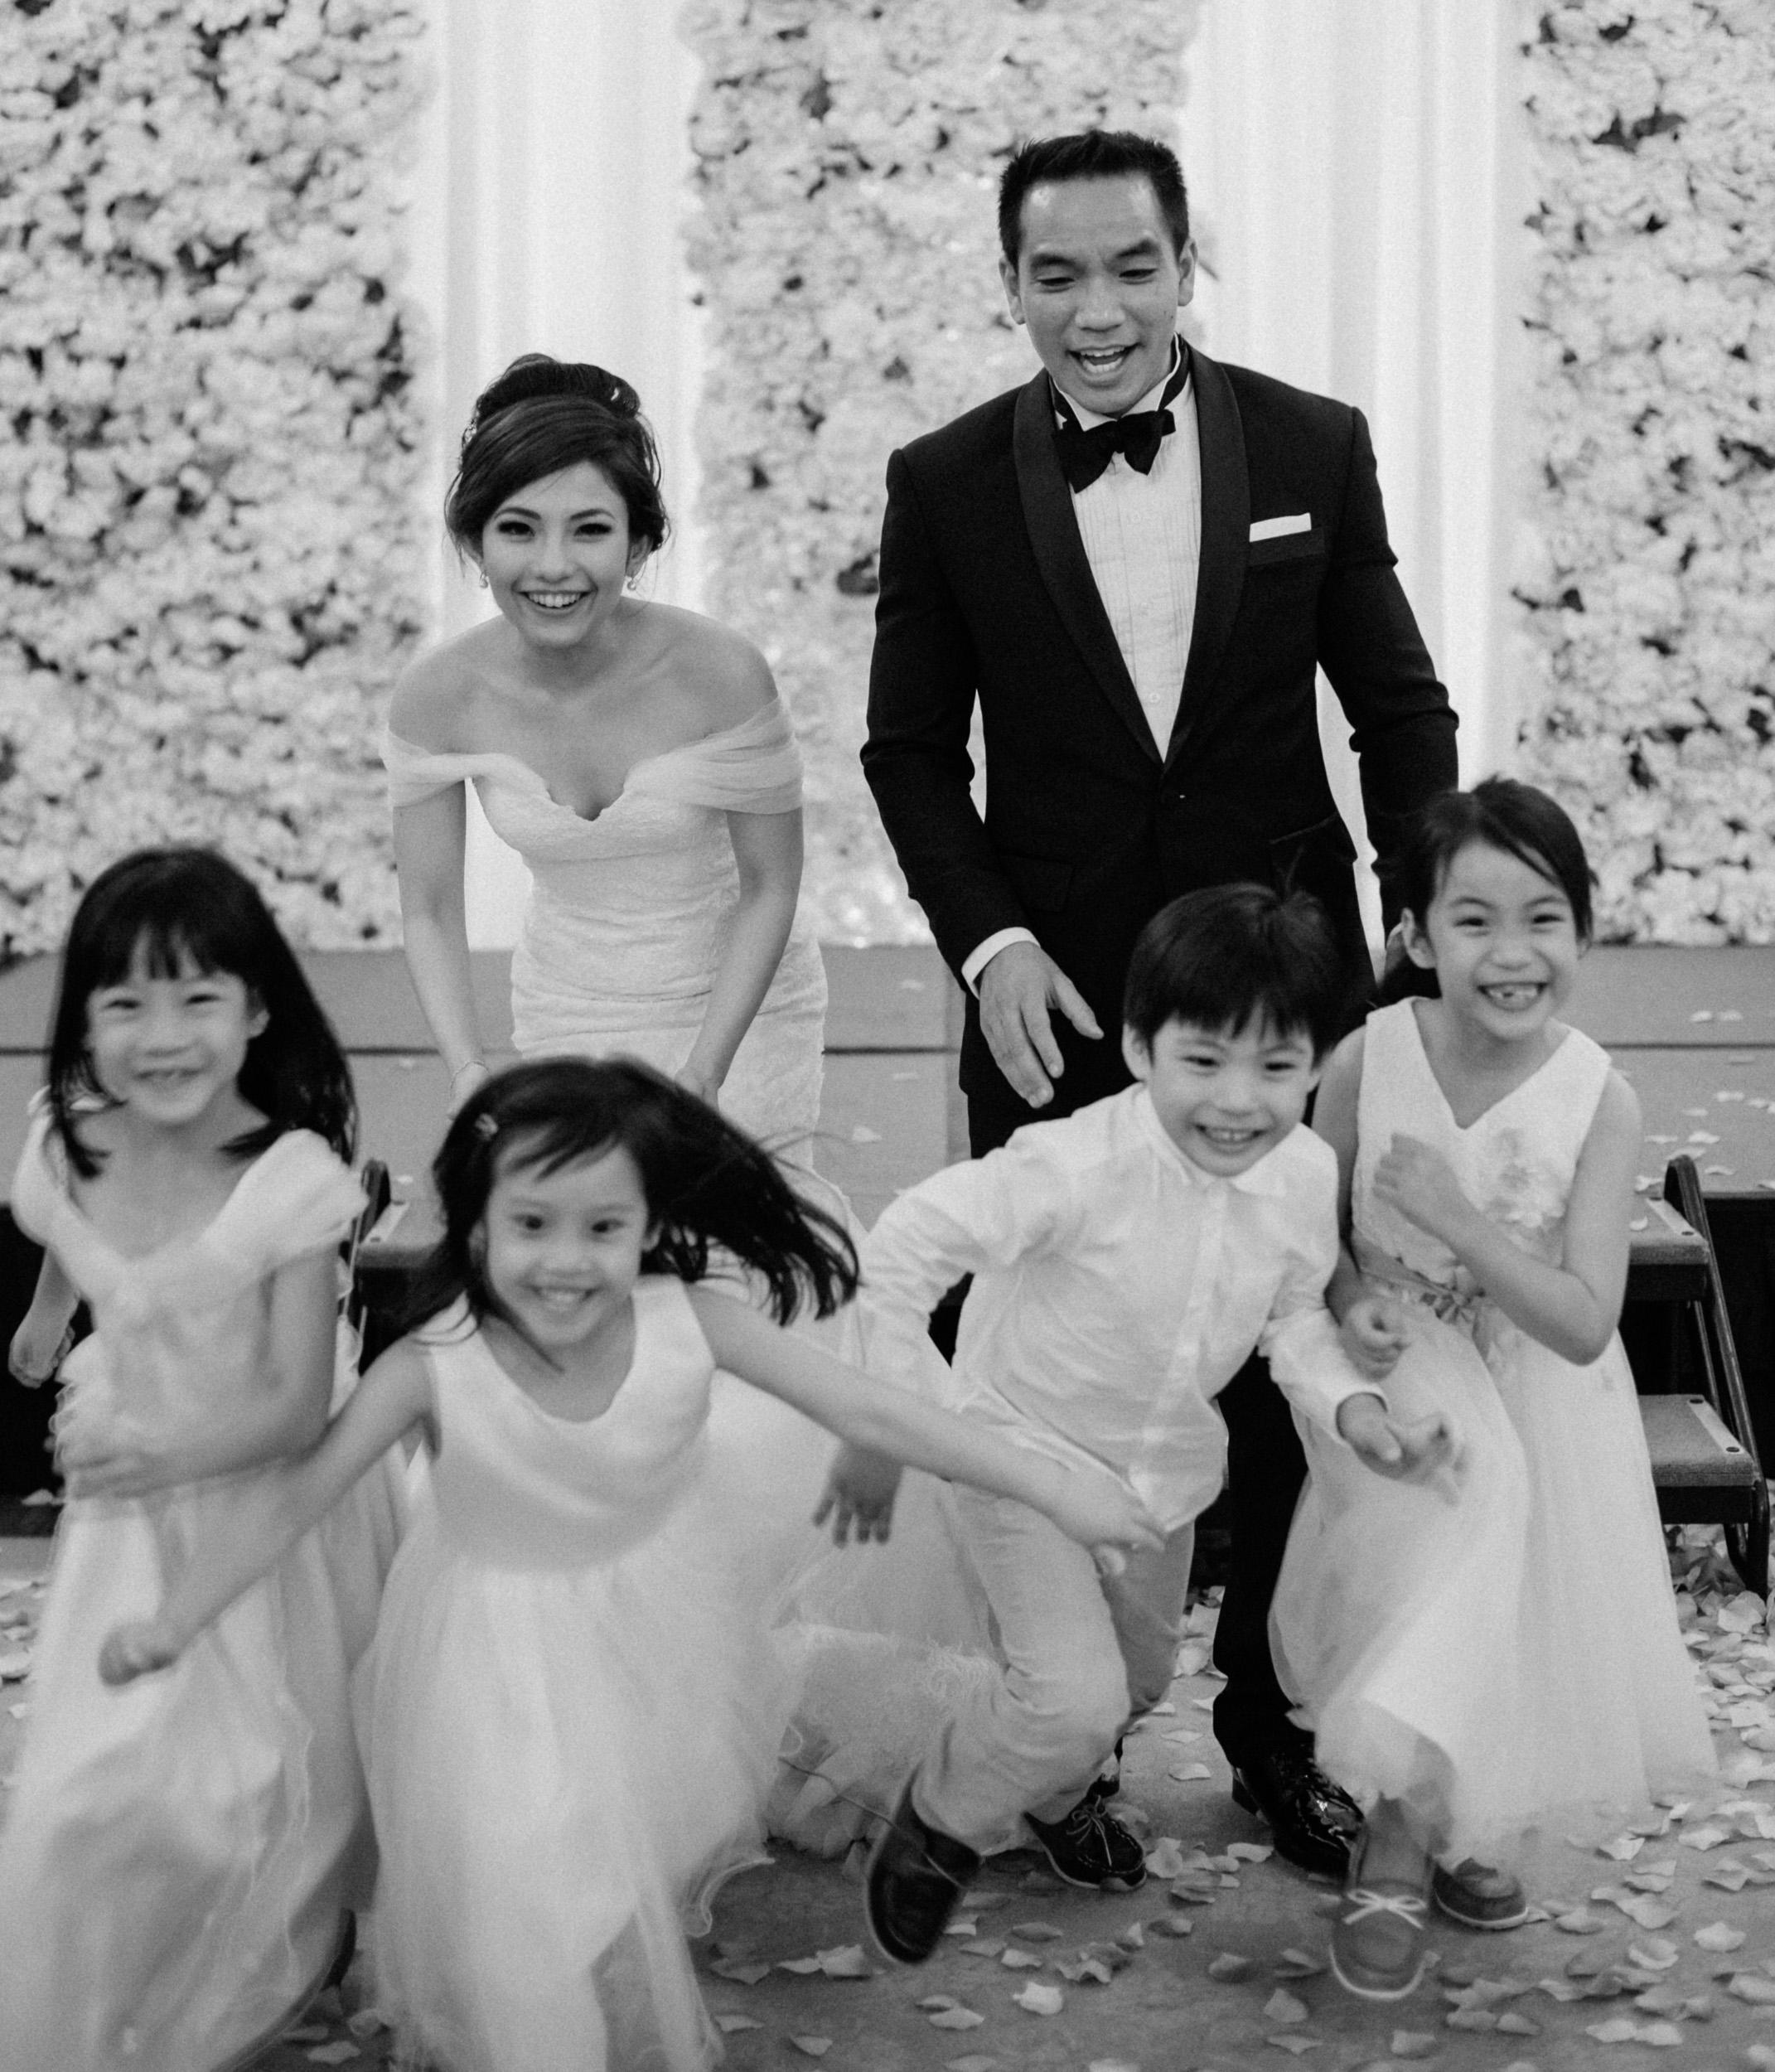 singapore-wedding-photographer-photography-wmt2017-106.jpg